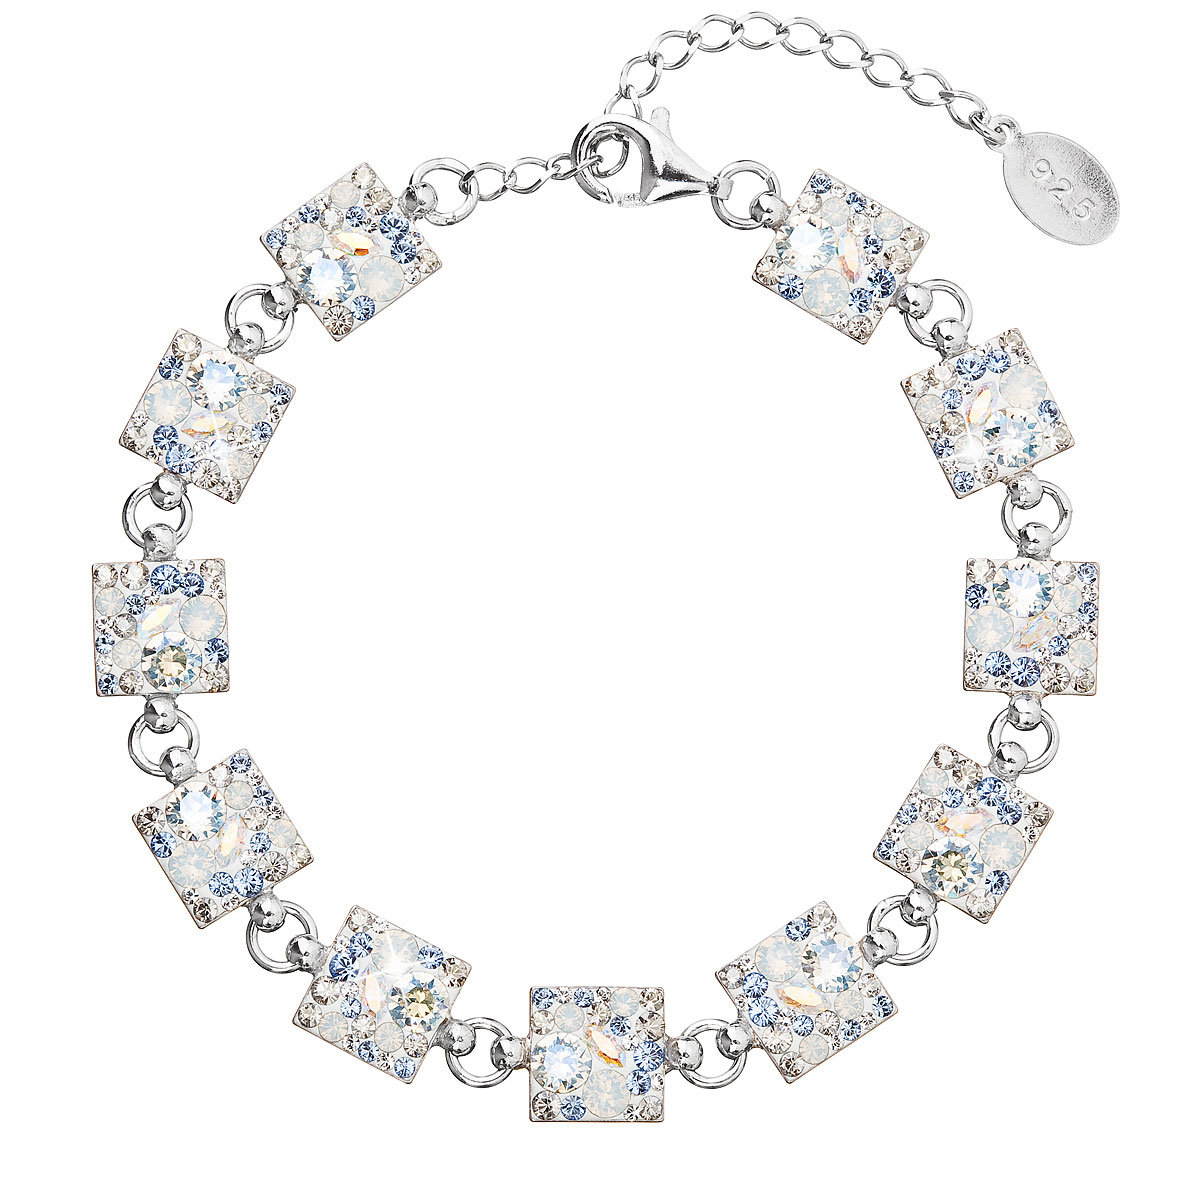 Evolution Group Stříbrný náramek se Swarovski krystaly modrý 33047.3 light sapphire